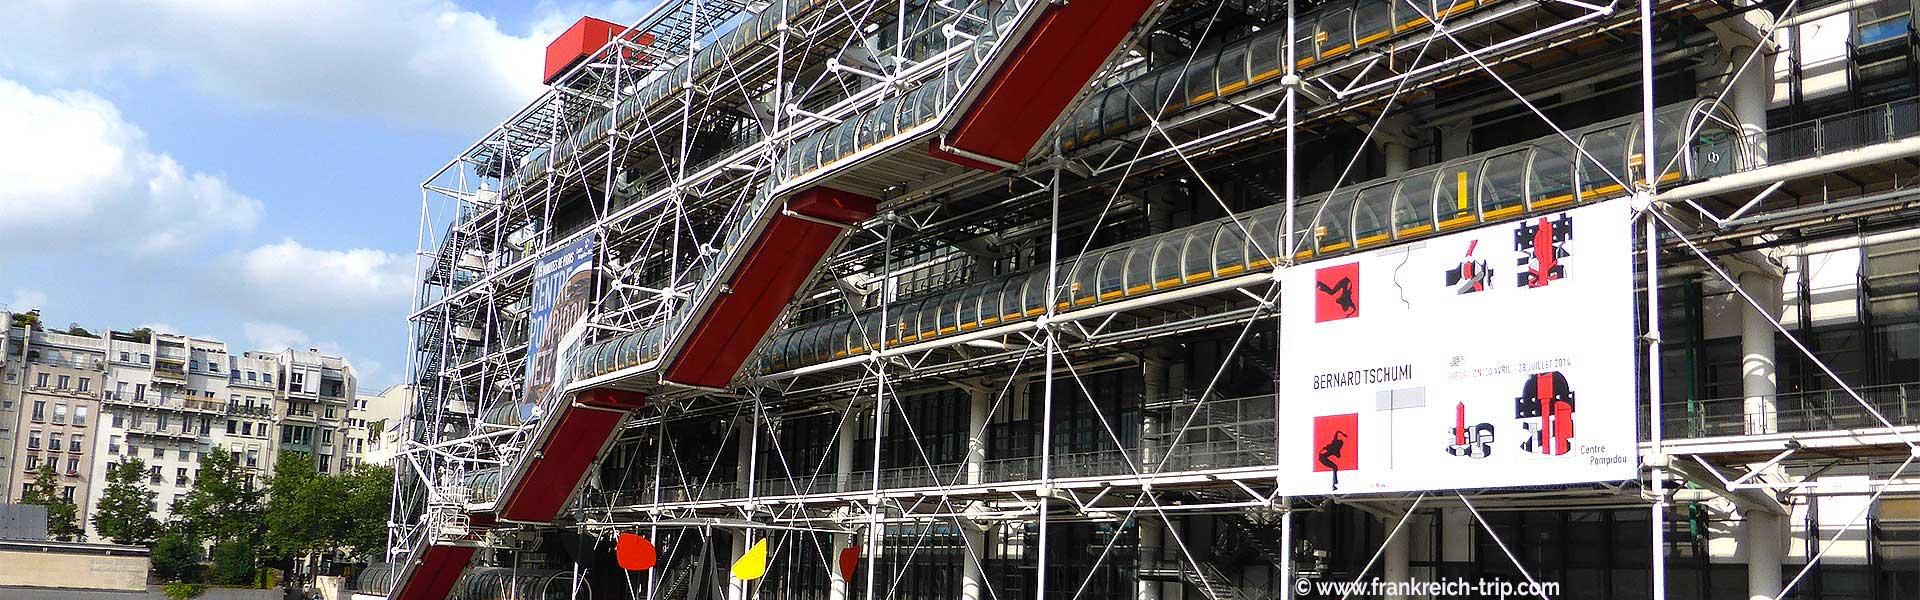 Centre Pompidou, Paris Sehenswürdigkeit